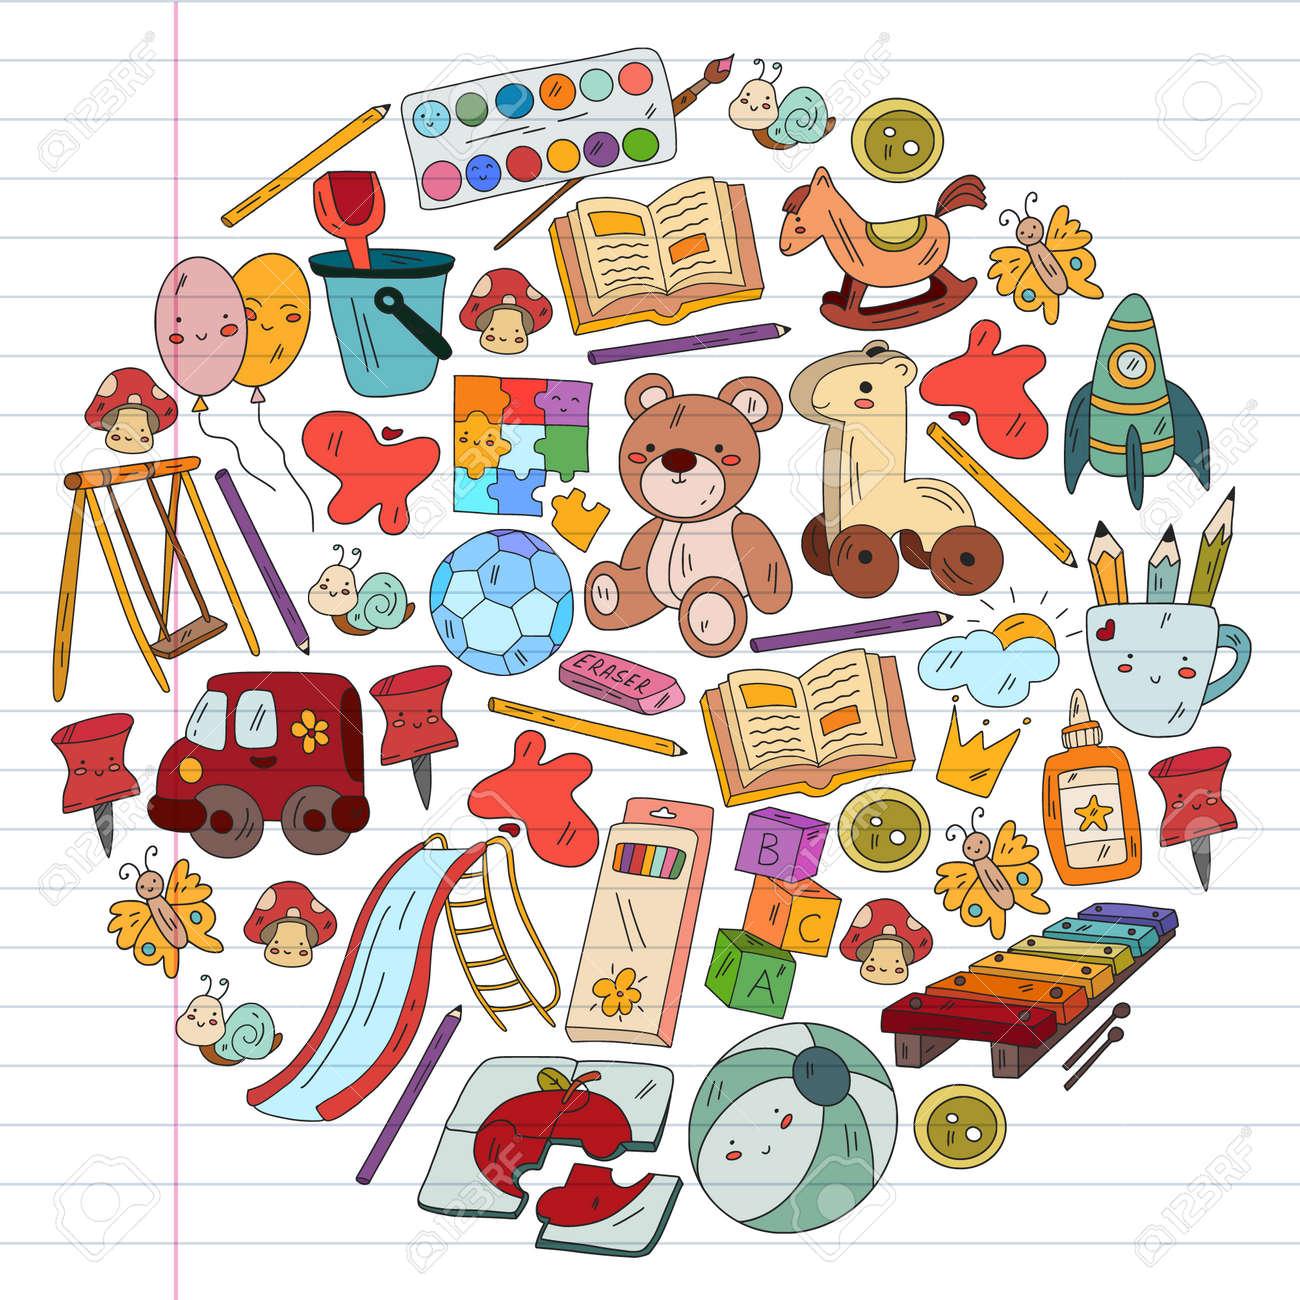 Children play with toys in the kindergarten. Kids playground. Education, creativity, imagination. - 173367377